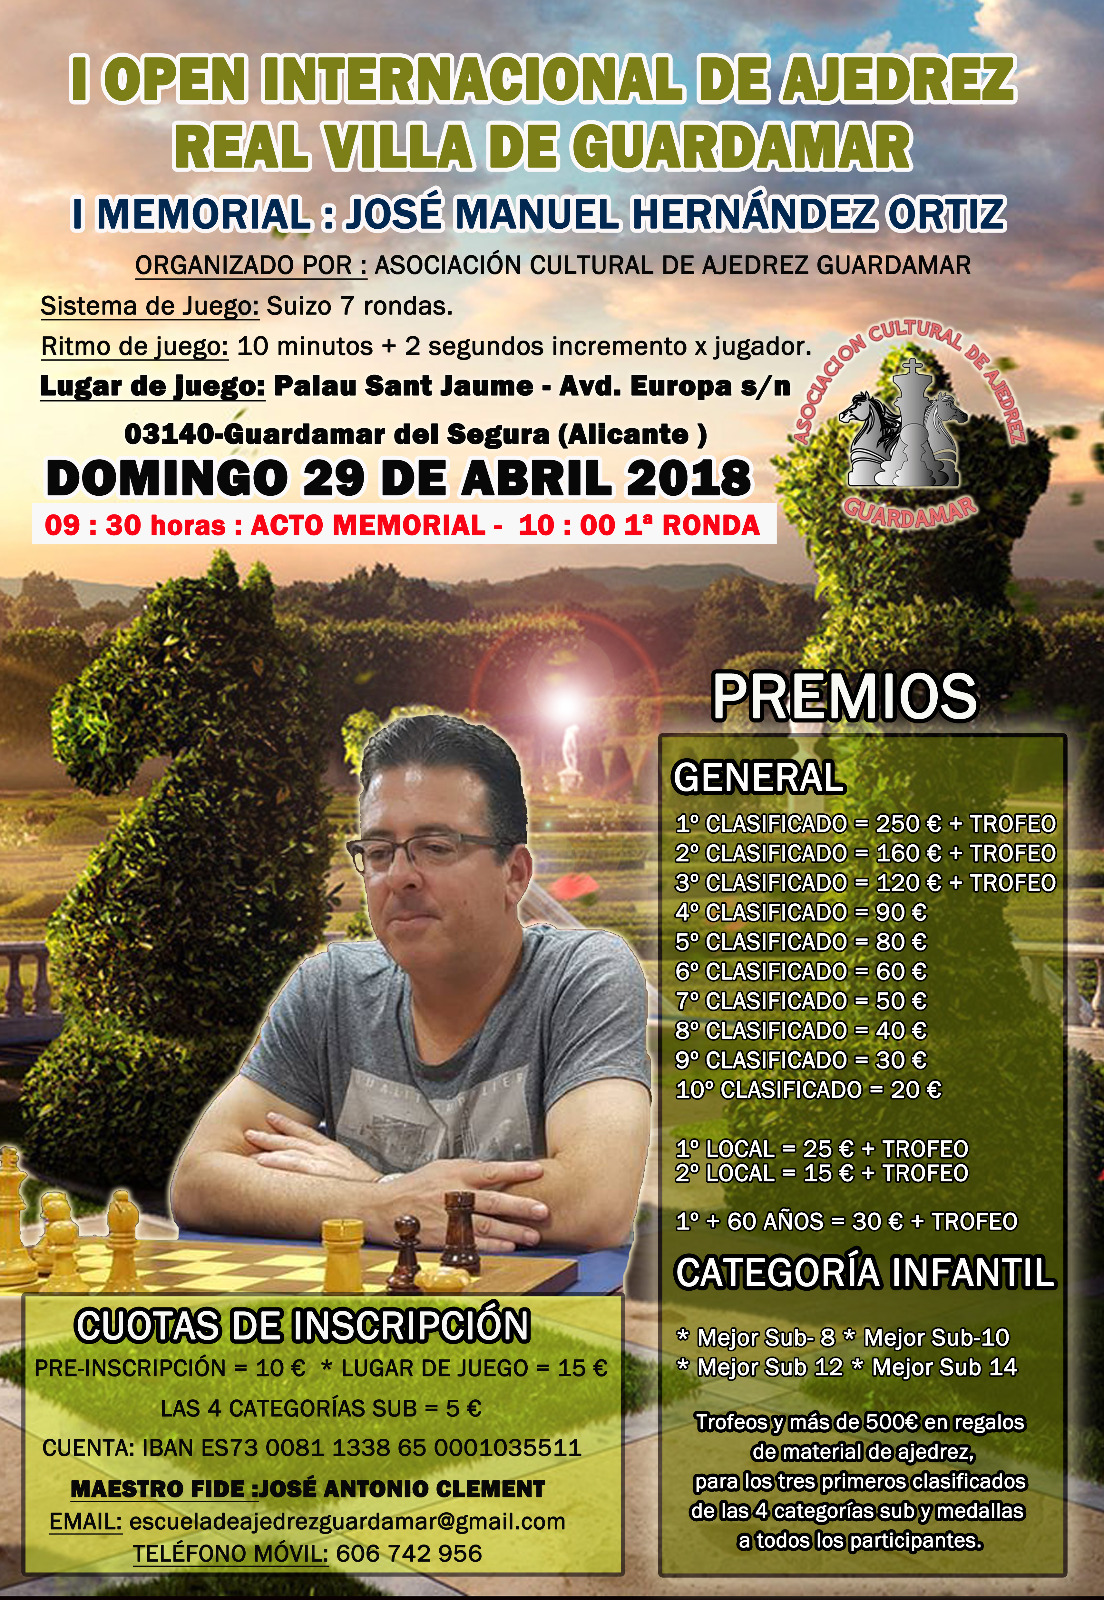 I Mem. José M. Hernández